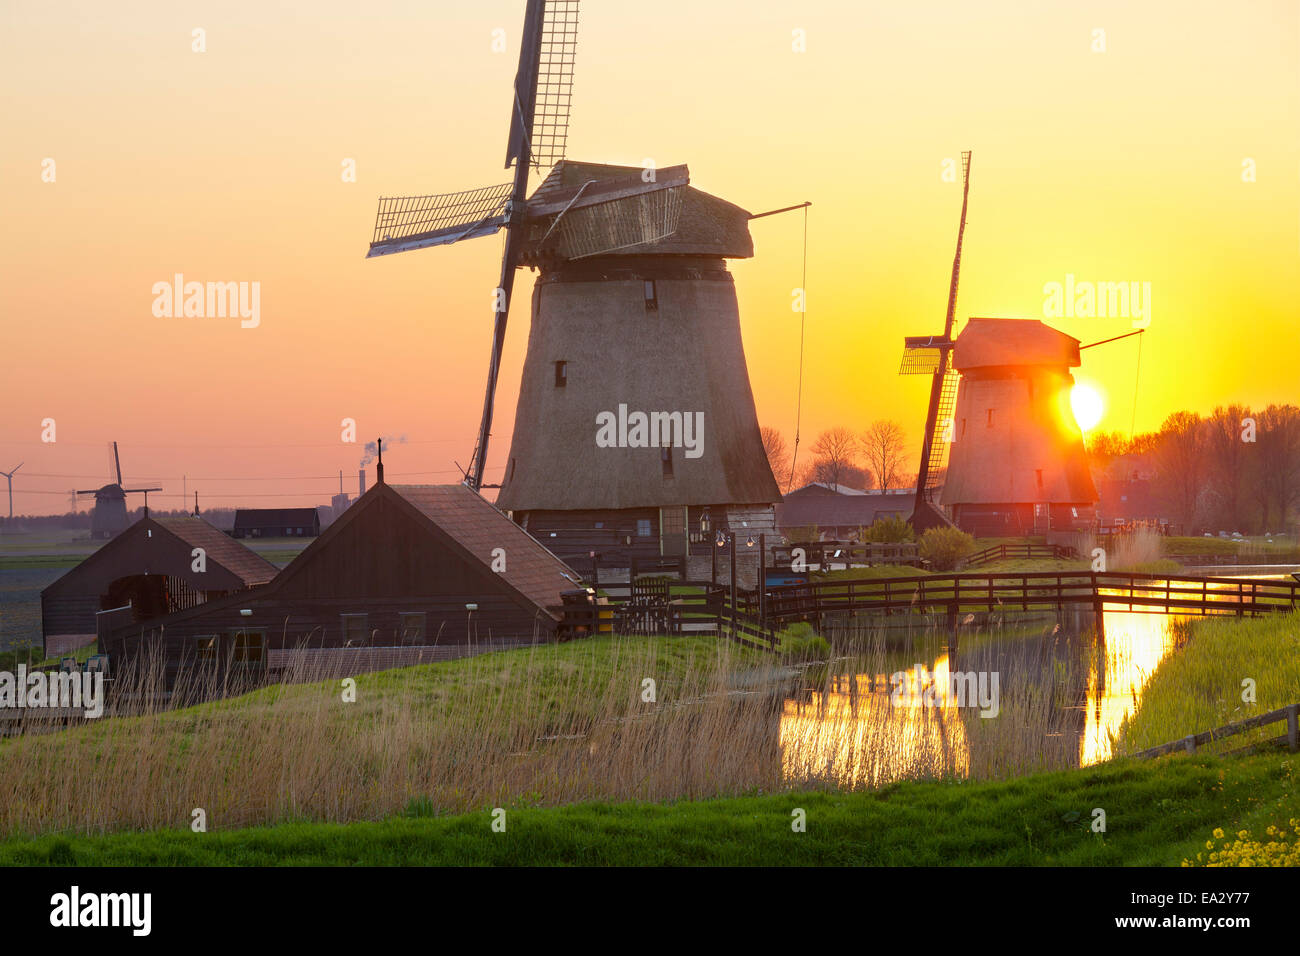 Windmills at sunset, Schermerhorn, North Holland, Netherlands, Europe - Stock Image